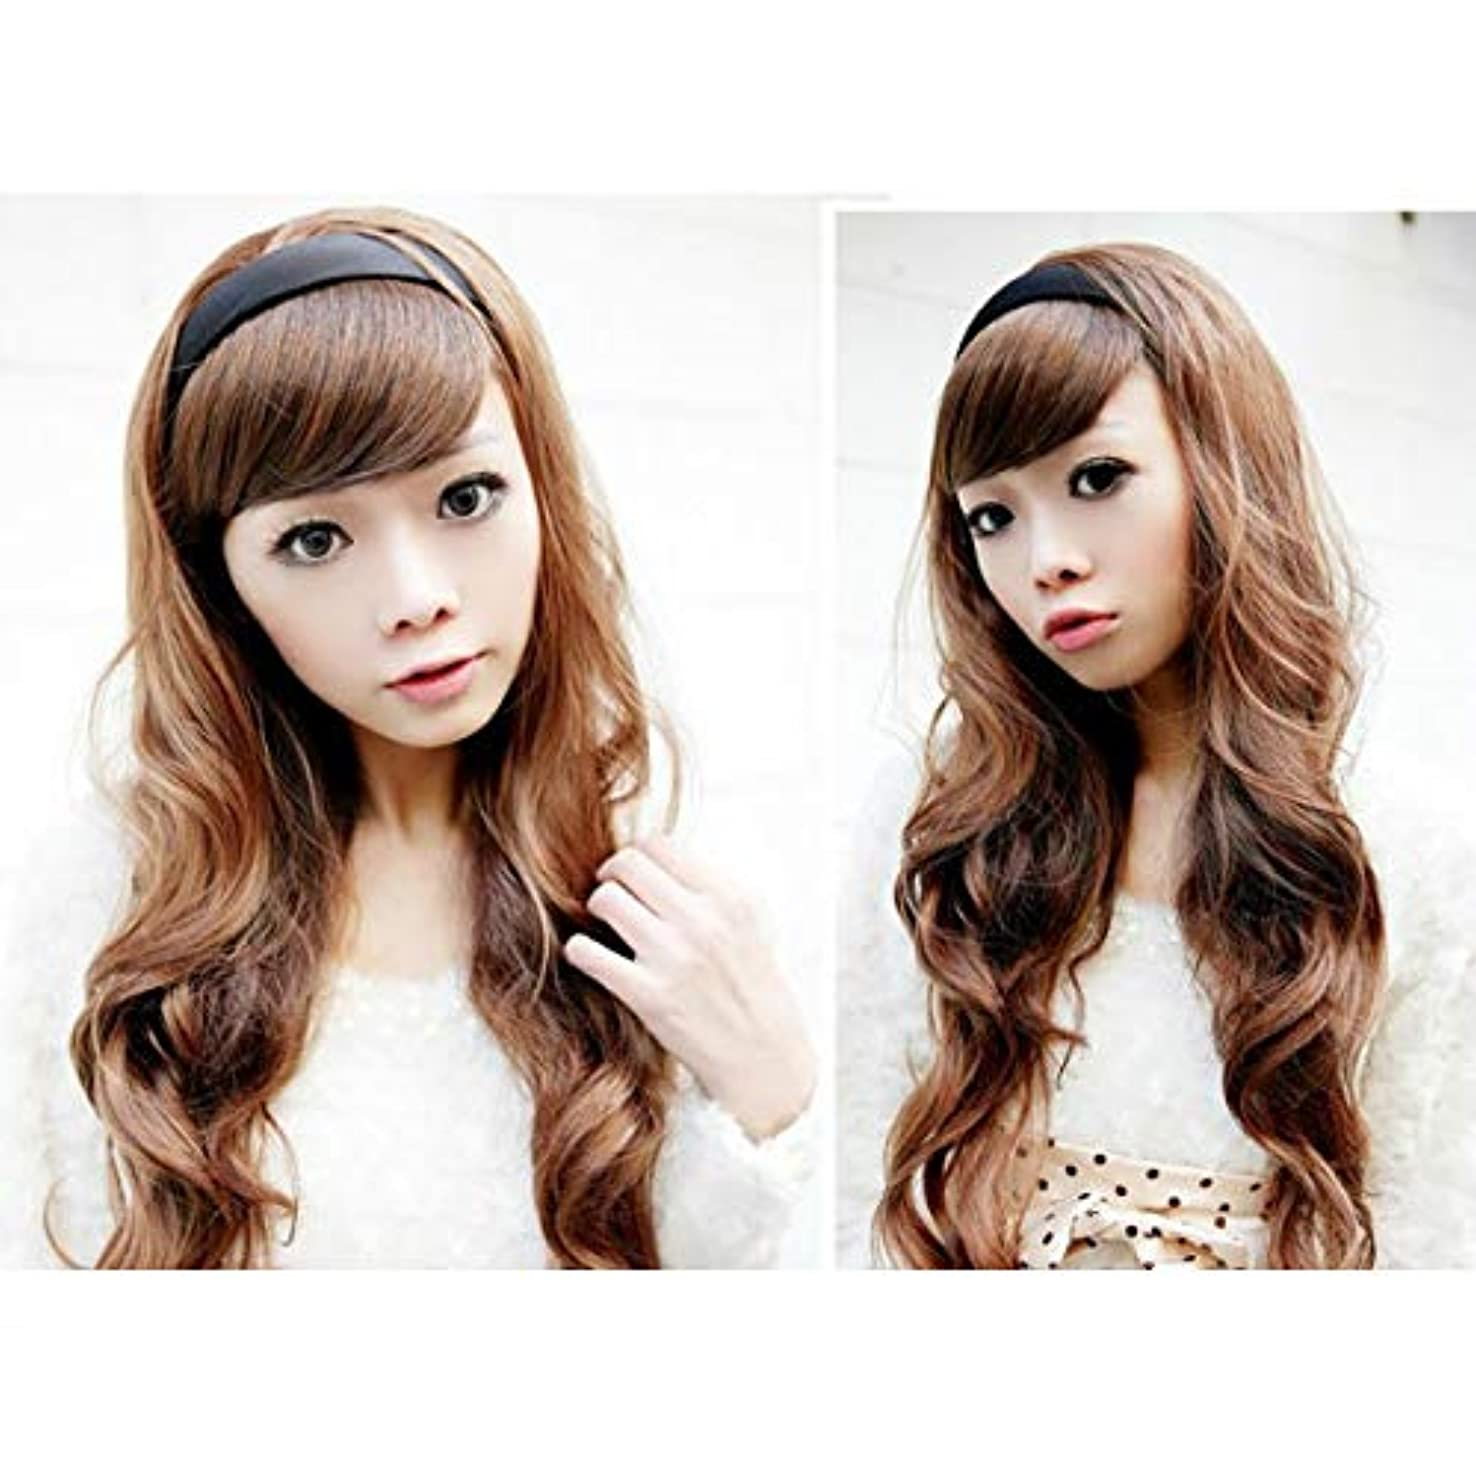 YZUEYT 女性の毛のウィッグは、黒いフープのヘッドブランドと長い波状 YZUEYT (Color : Color Dark Brown, Size : One size)